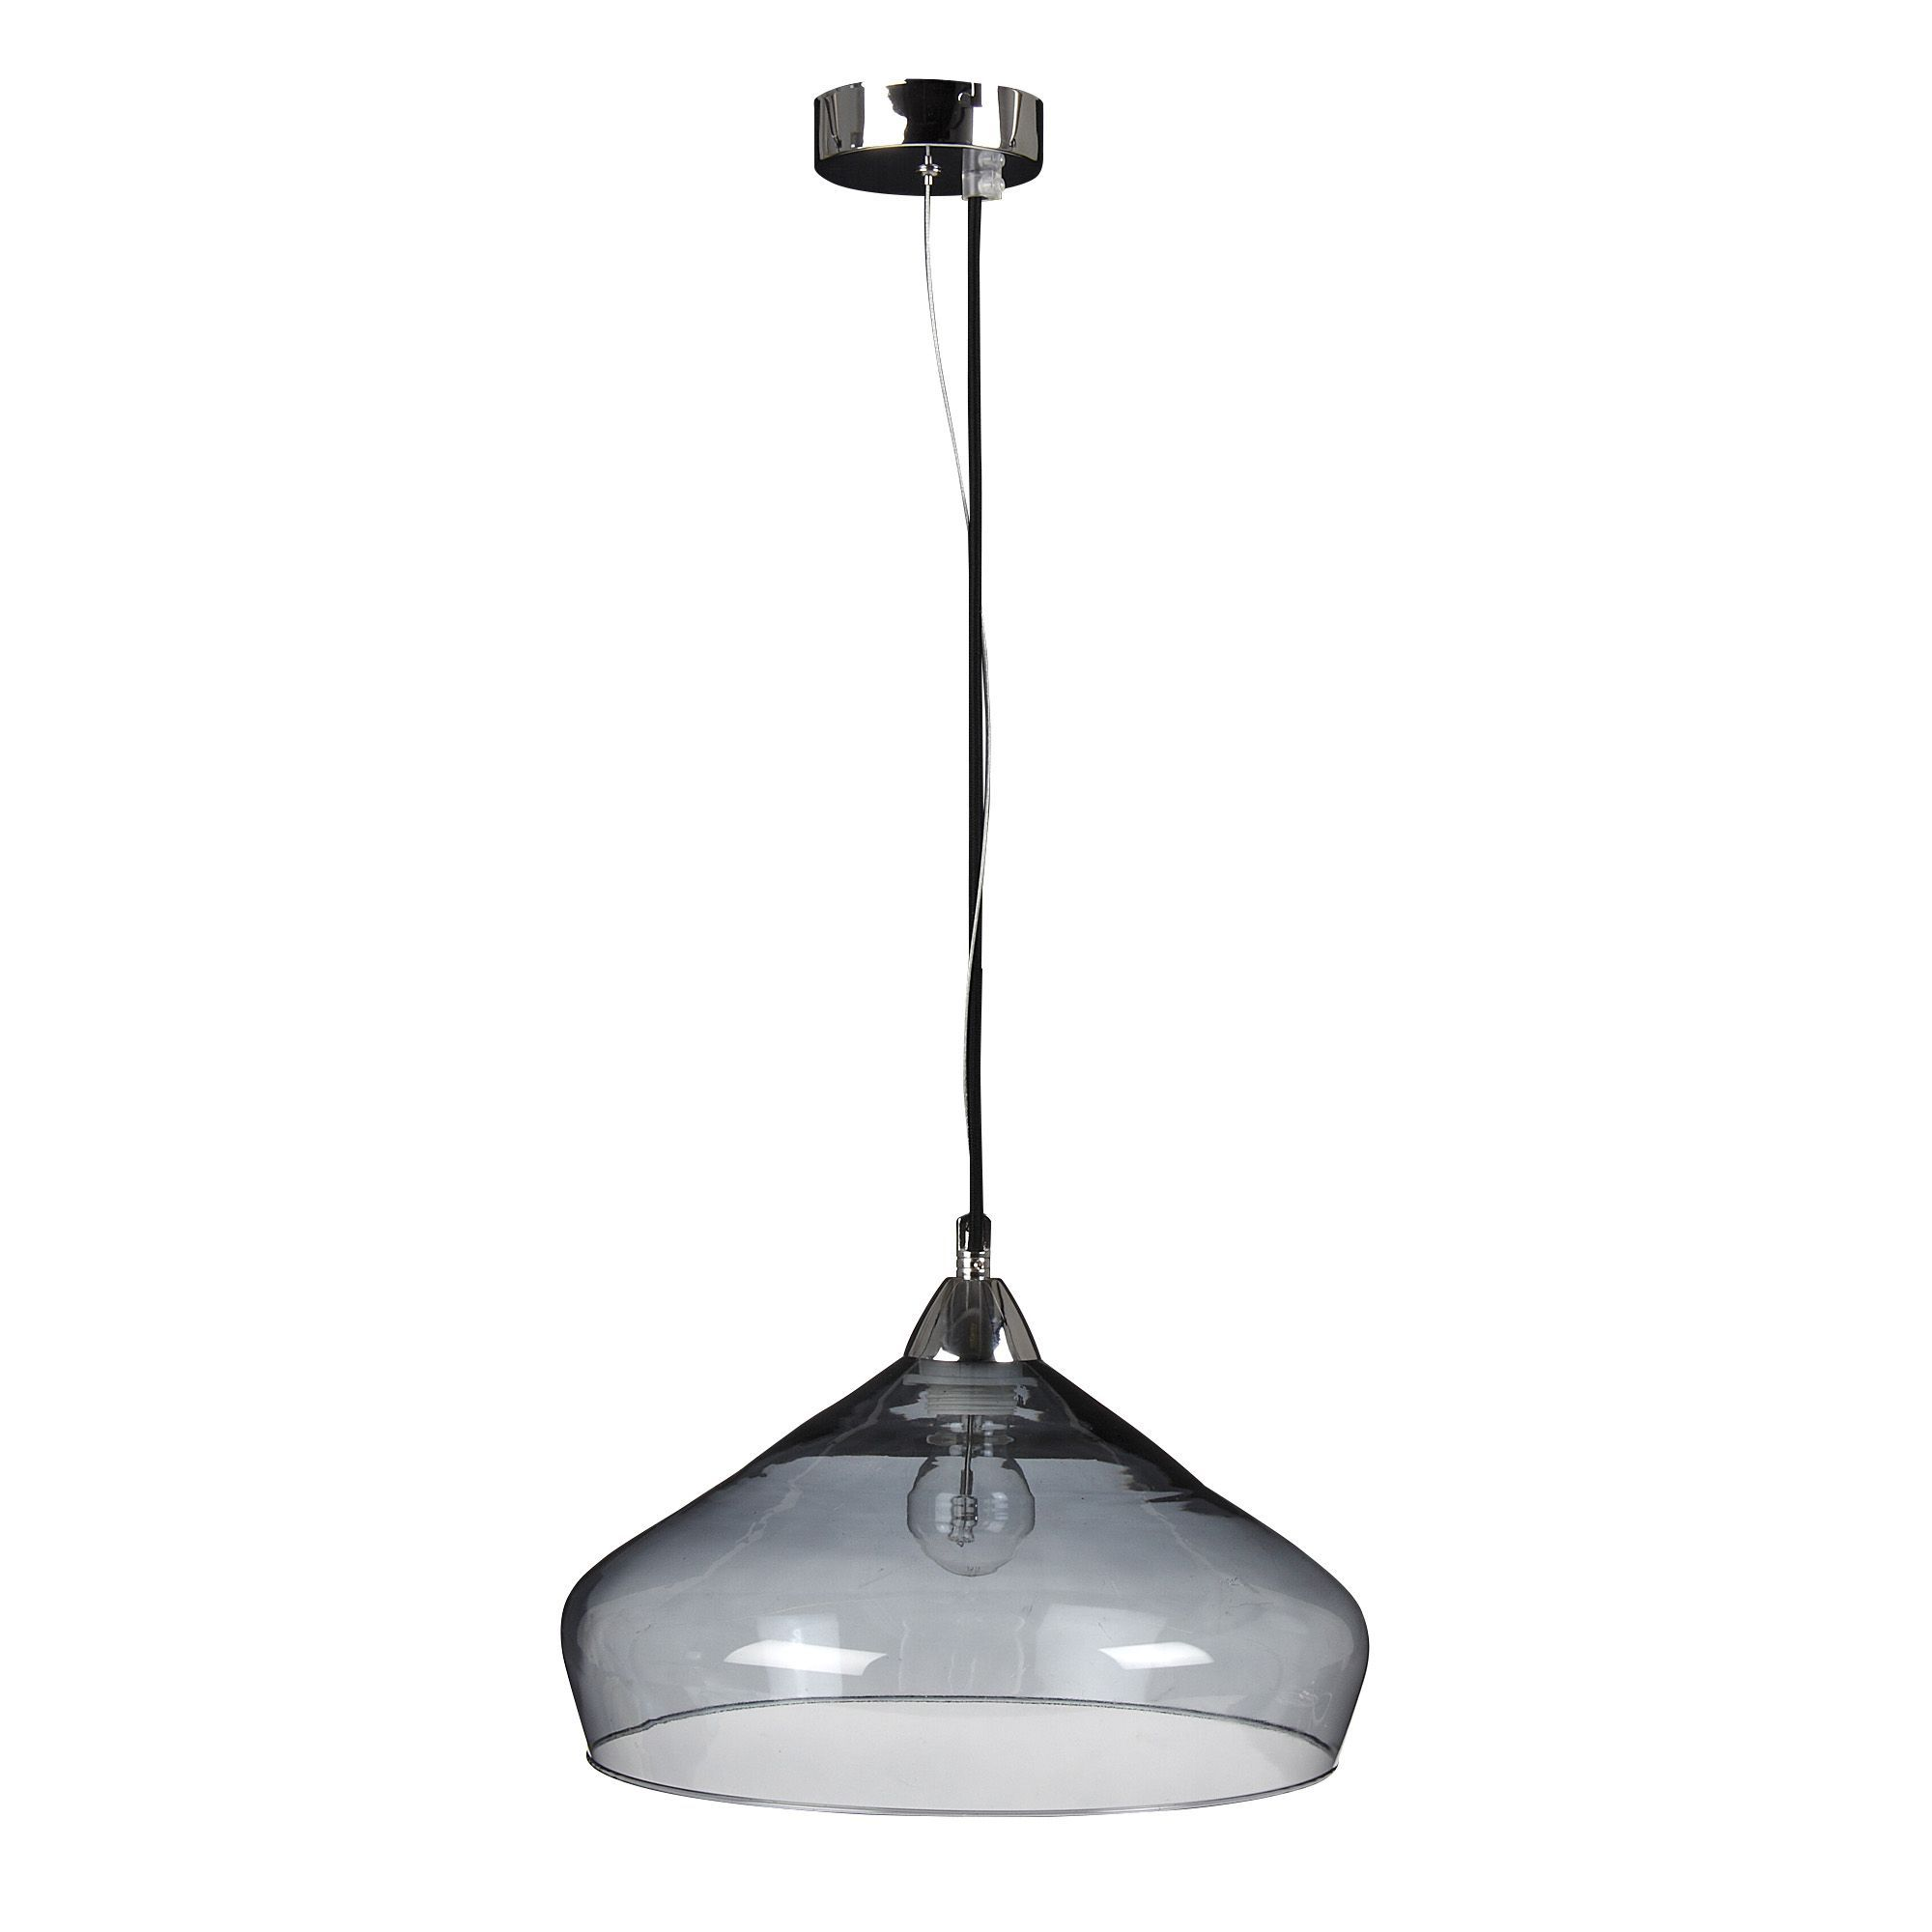 suspension verre fum d30cm transparent estambul les suspensions et lustres luminaires. Black Bedroom Furniture Sets. Home Design Ideas